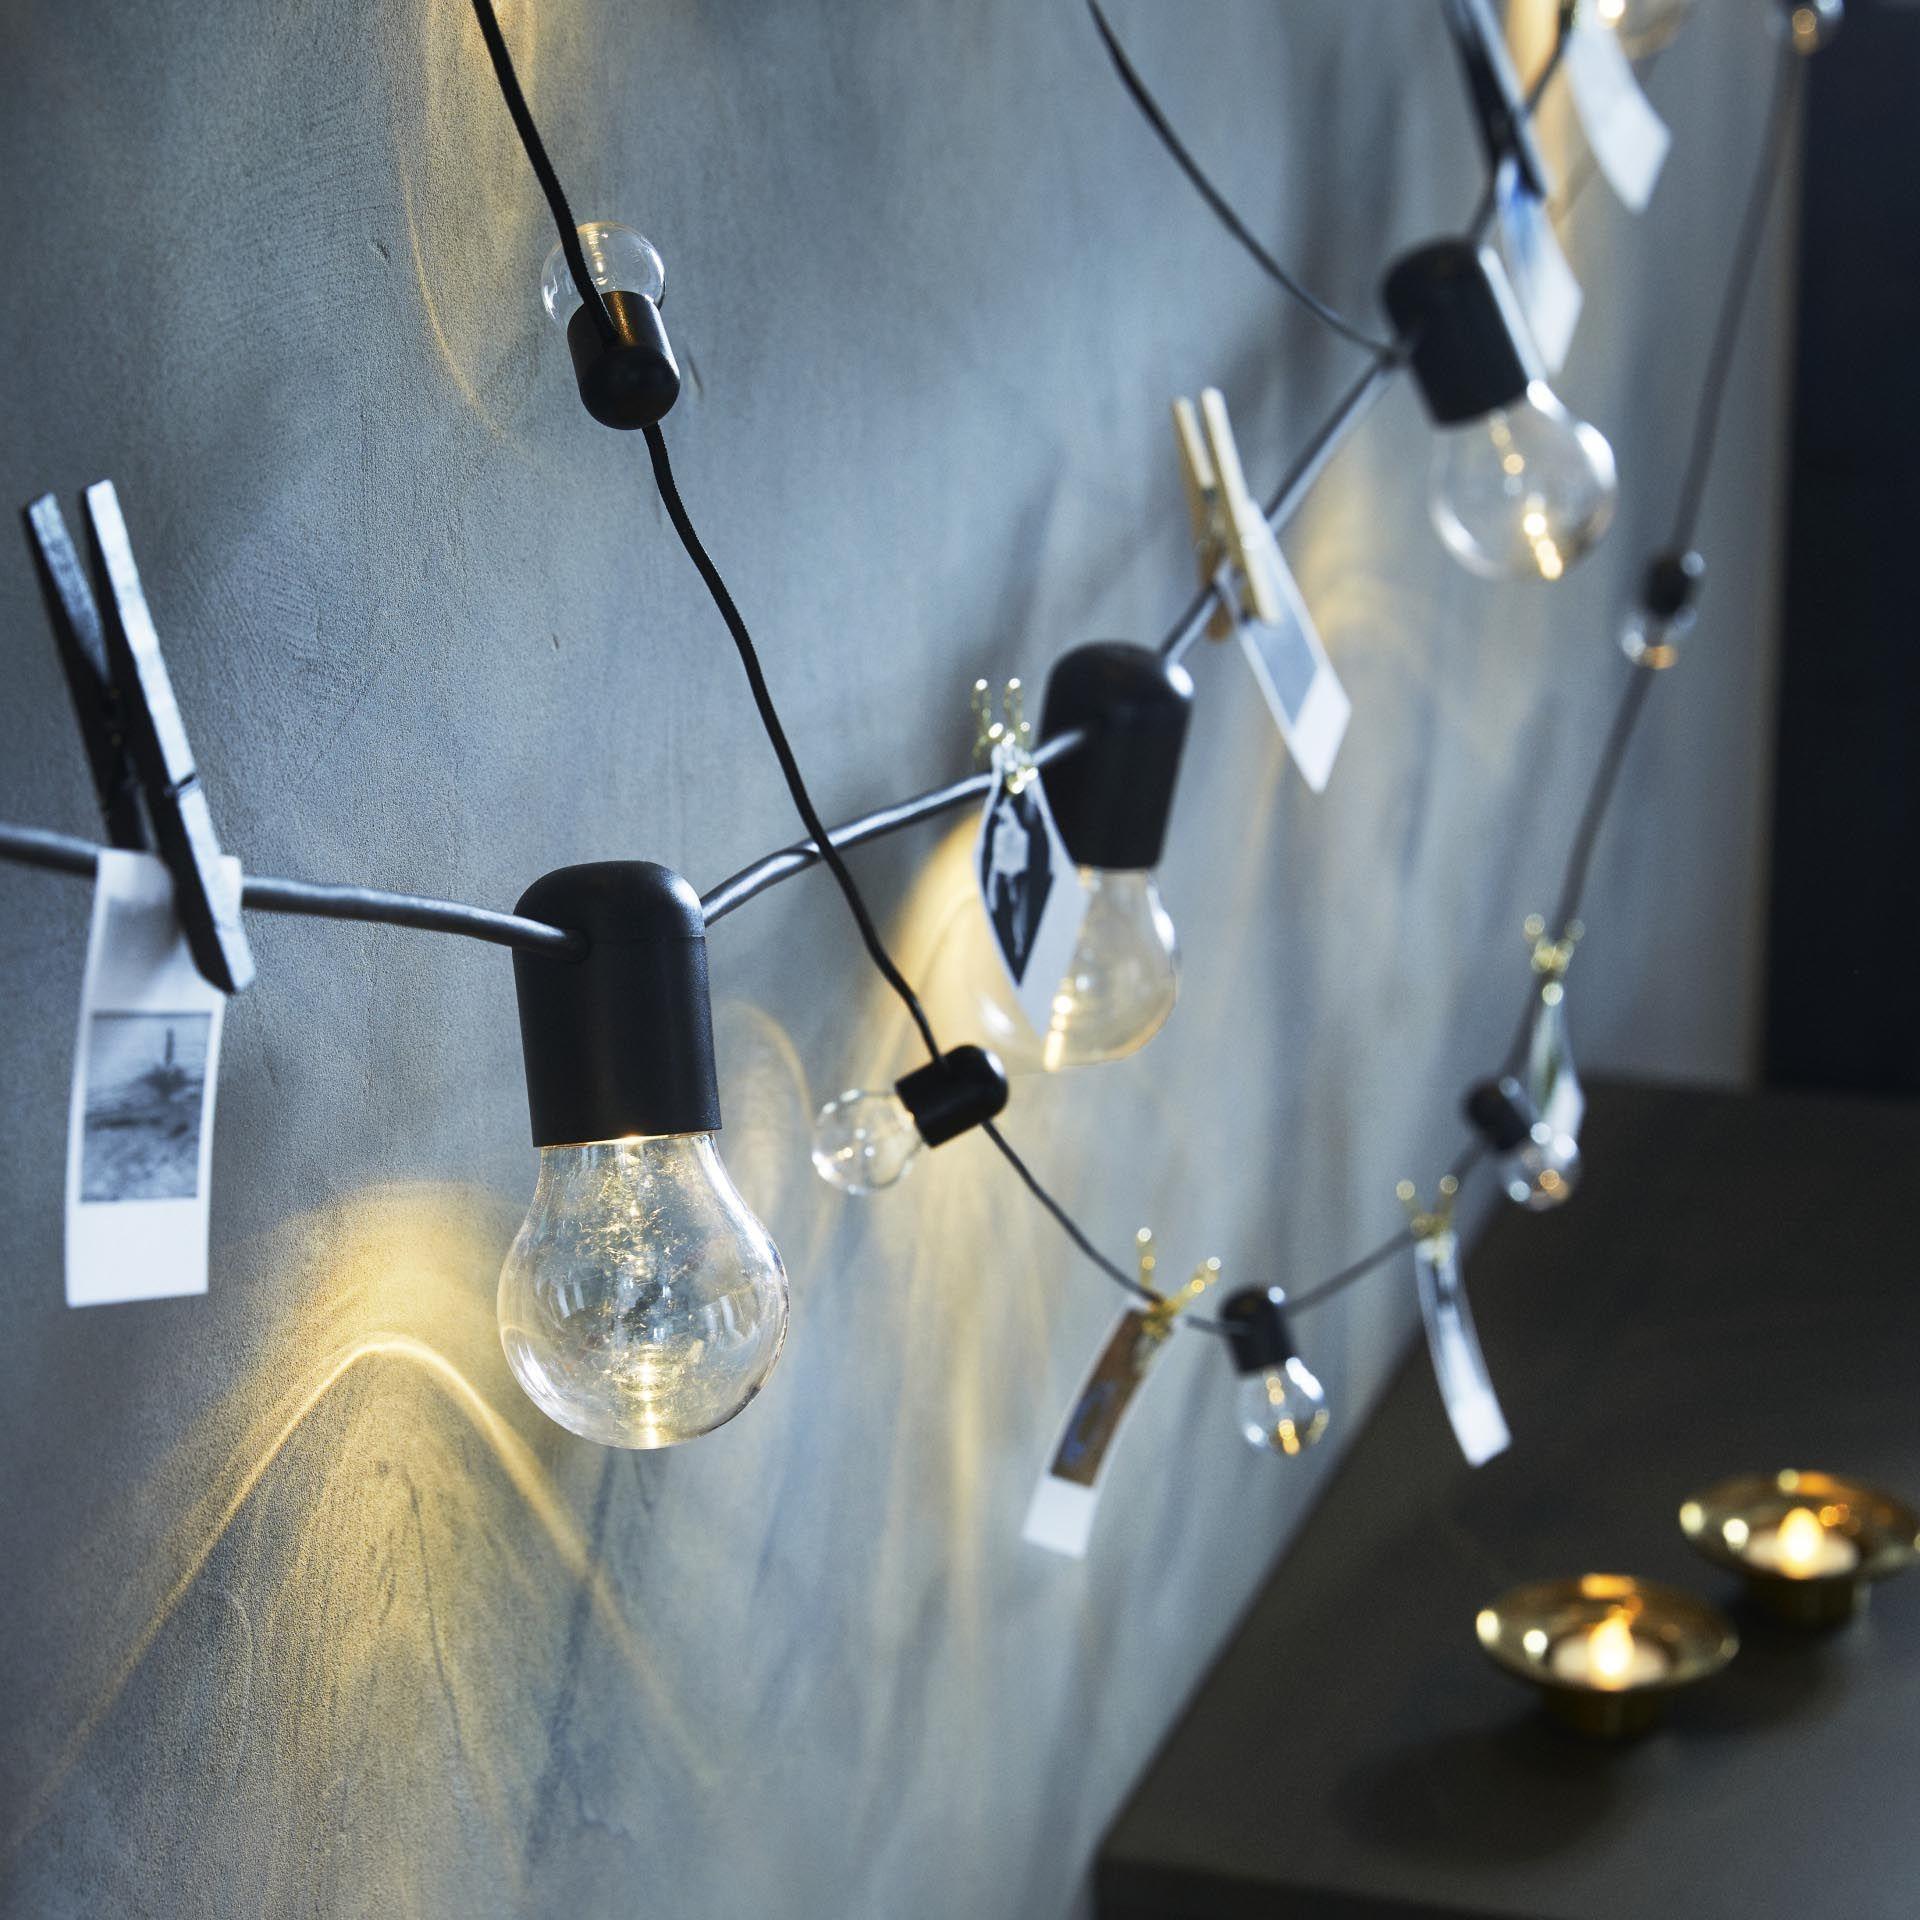 BlÖtsnÖ Led Lichtsnoer Met 24 Lampjes Binnen Zwart Ikea Lichtslingers Slaapkamer Diy Decoratie Slaapkamer Tiener Slaapkamer Meisjes